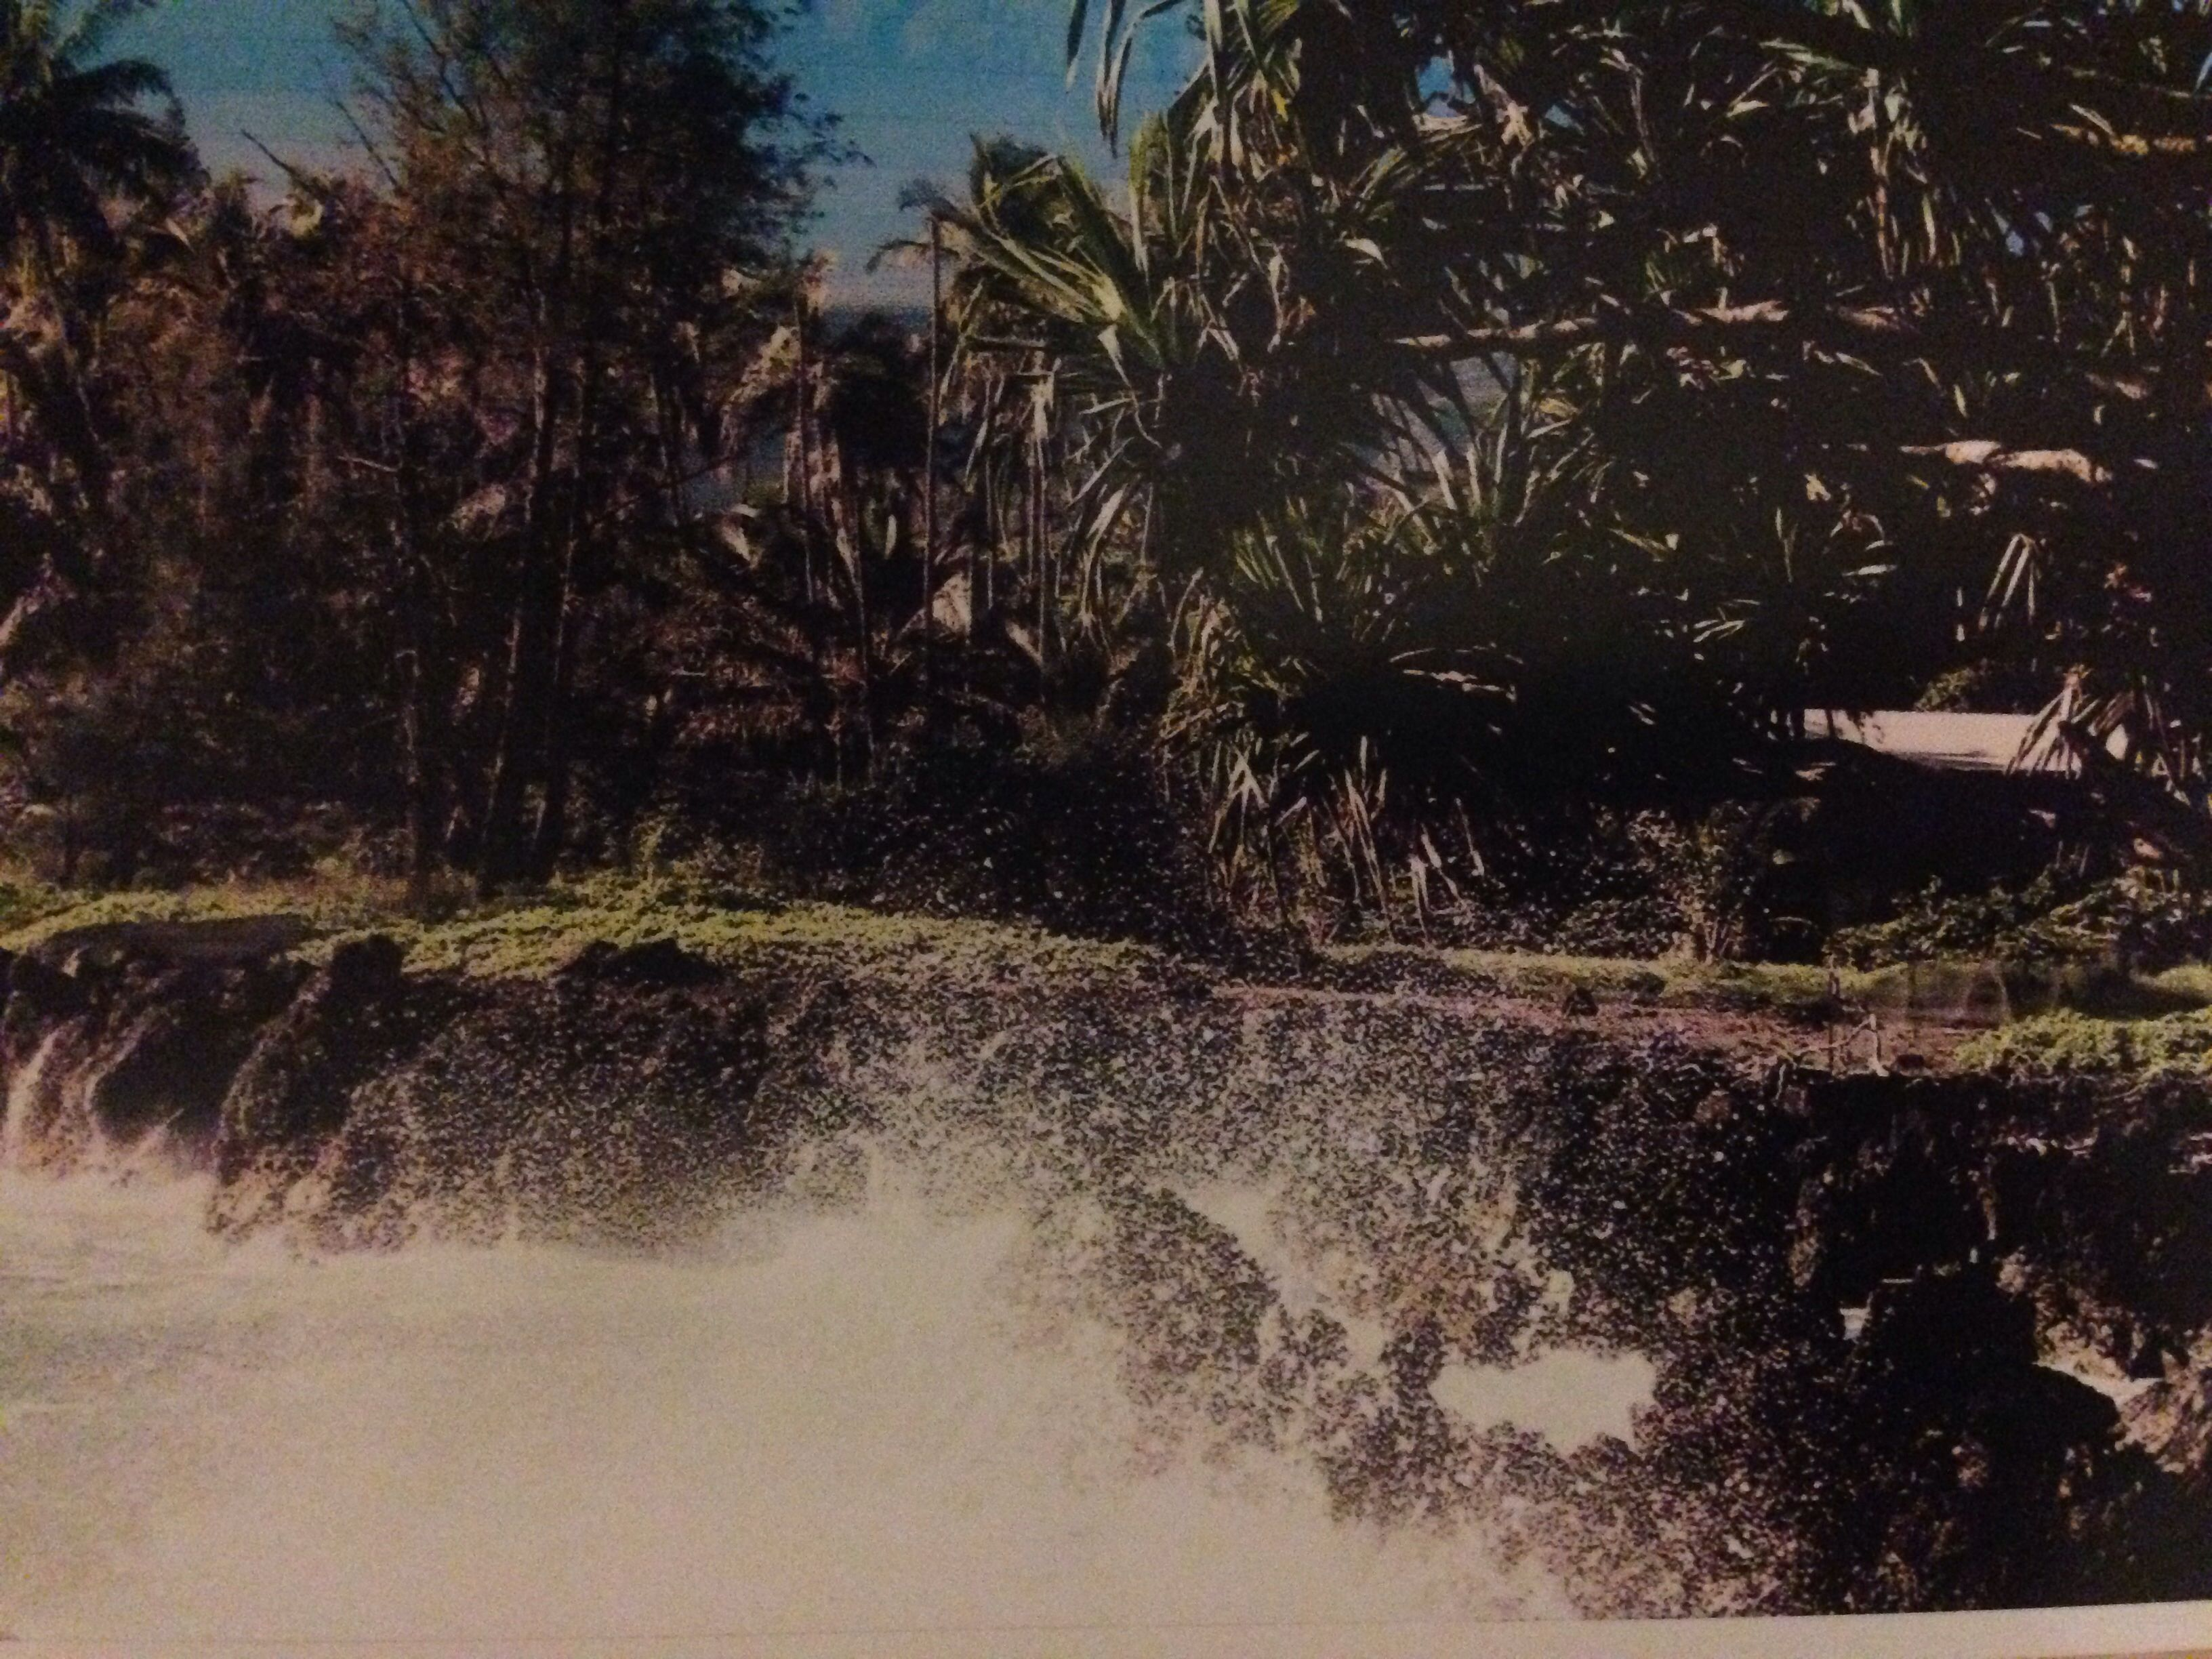 Maui Hawaii  2004